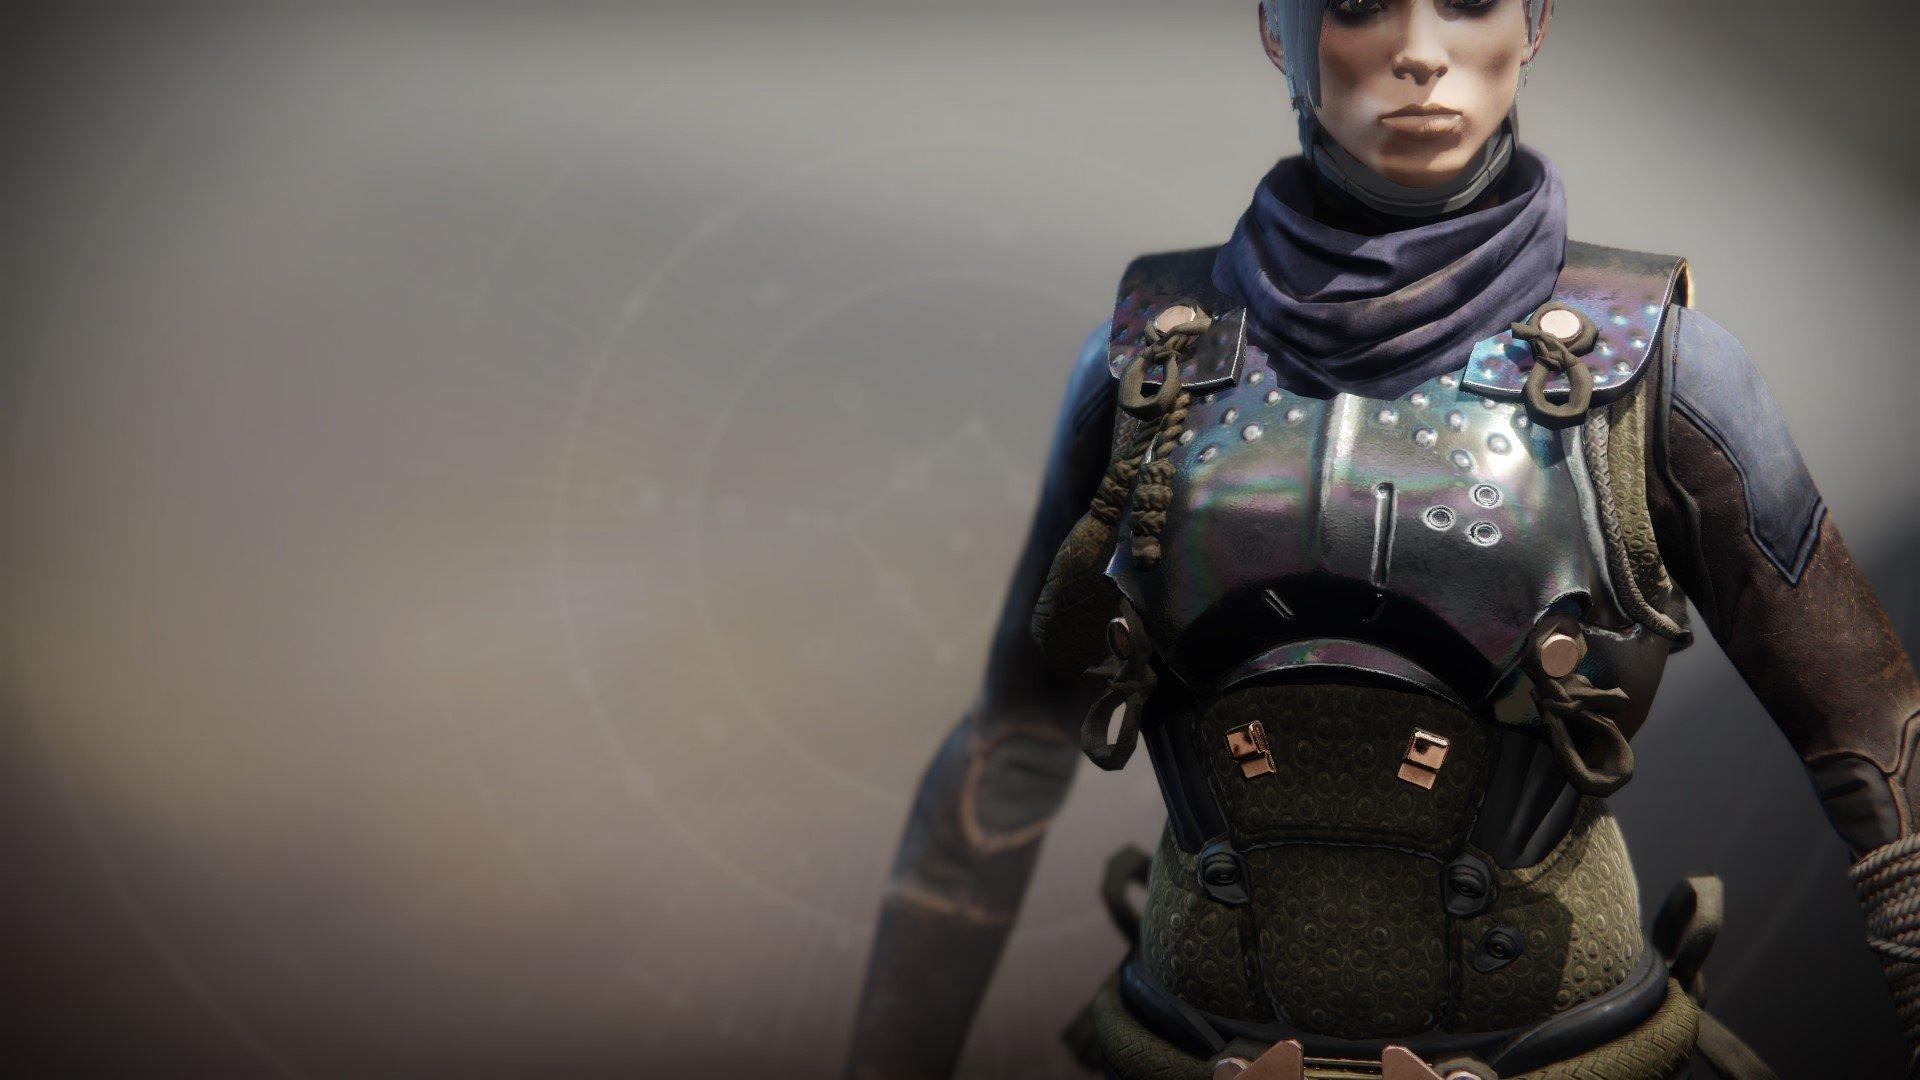 An in-game render of the Vest of Feltroc.